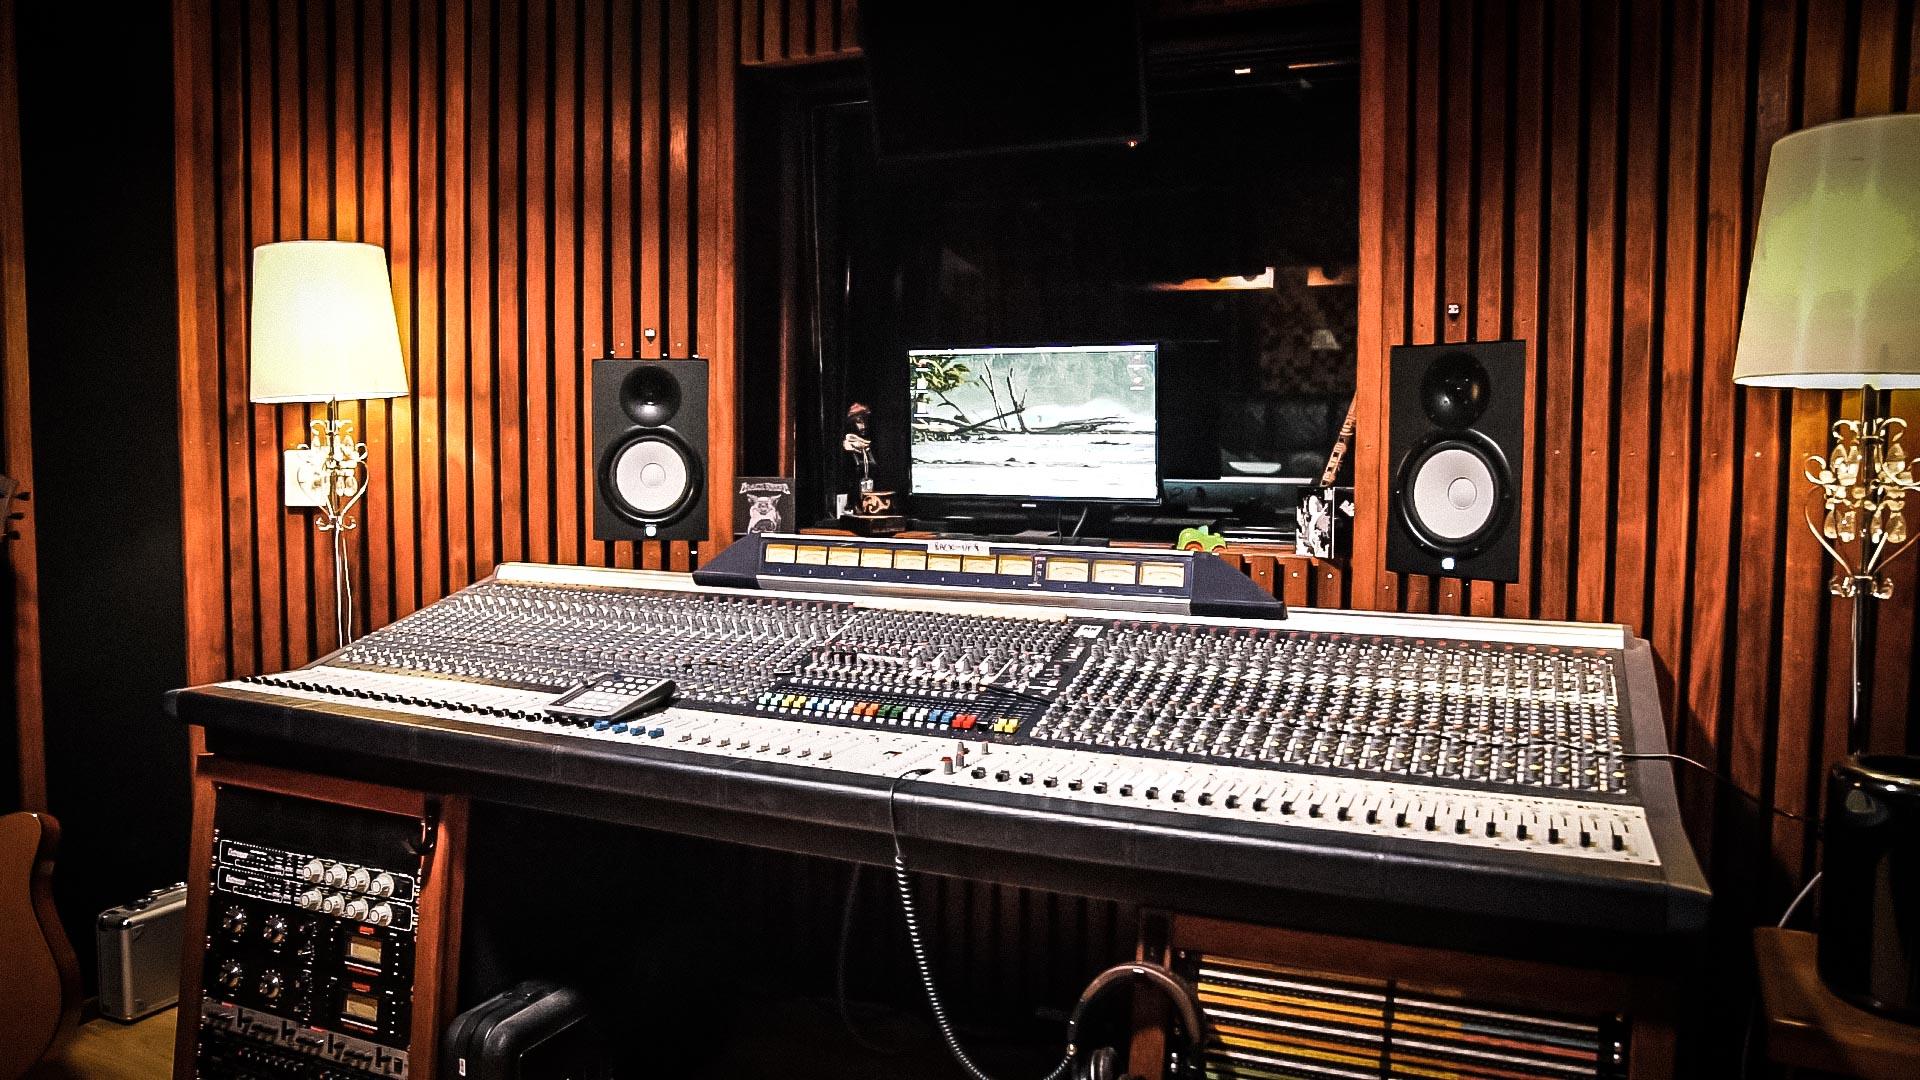 Online Mixing Services - Recording Studio - 1